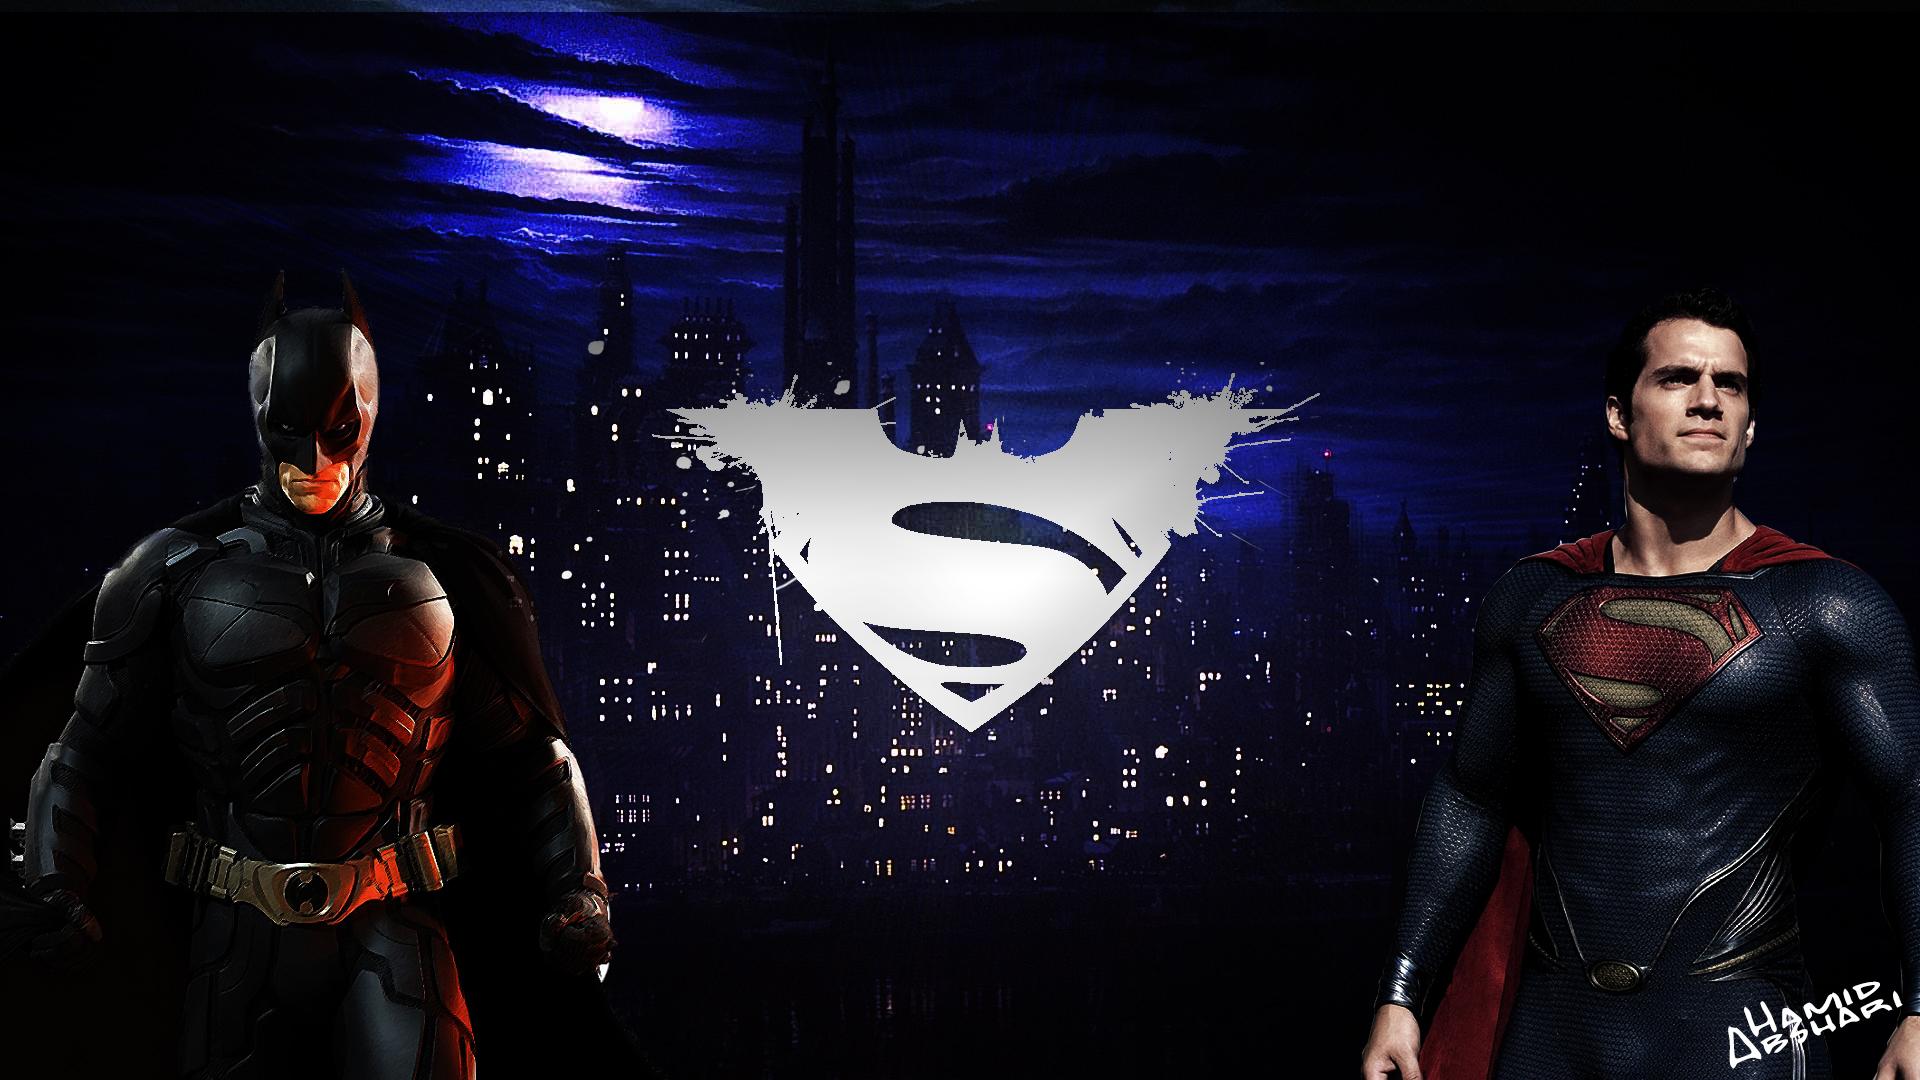 Batman Vs Superman Dawn Of Justice 2016 IPhone Desktop Wallpapers 750x1334 View 0 Download Star Wars The Force Awakens Hd Mp4 Movie Videos 1920x1080